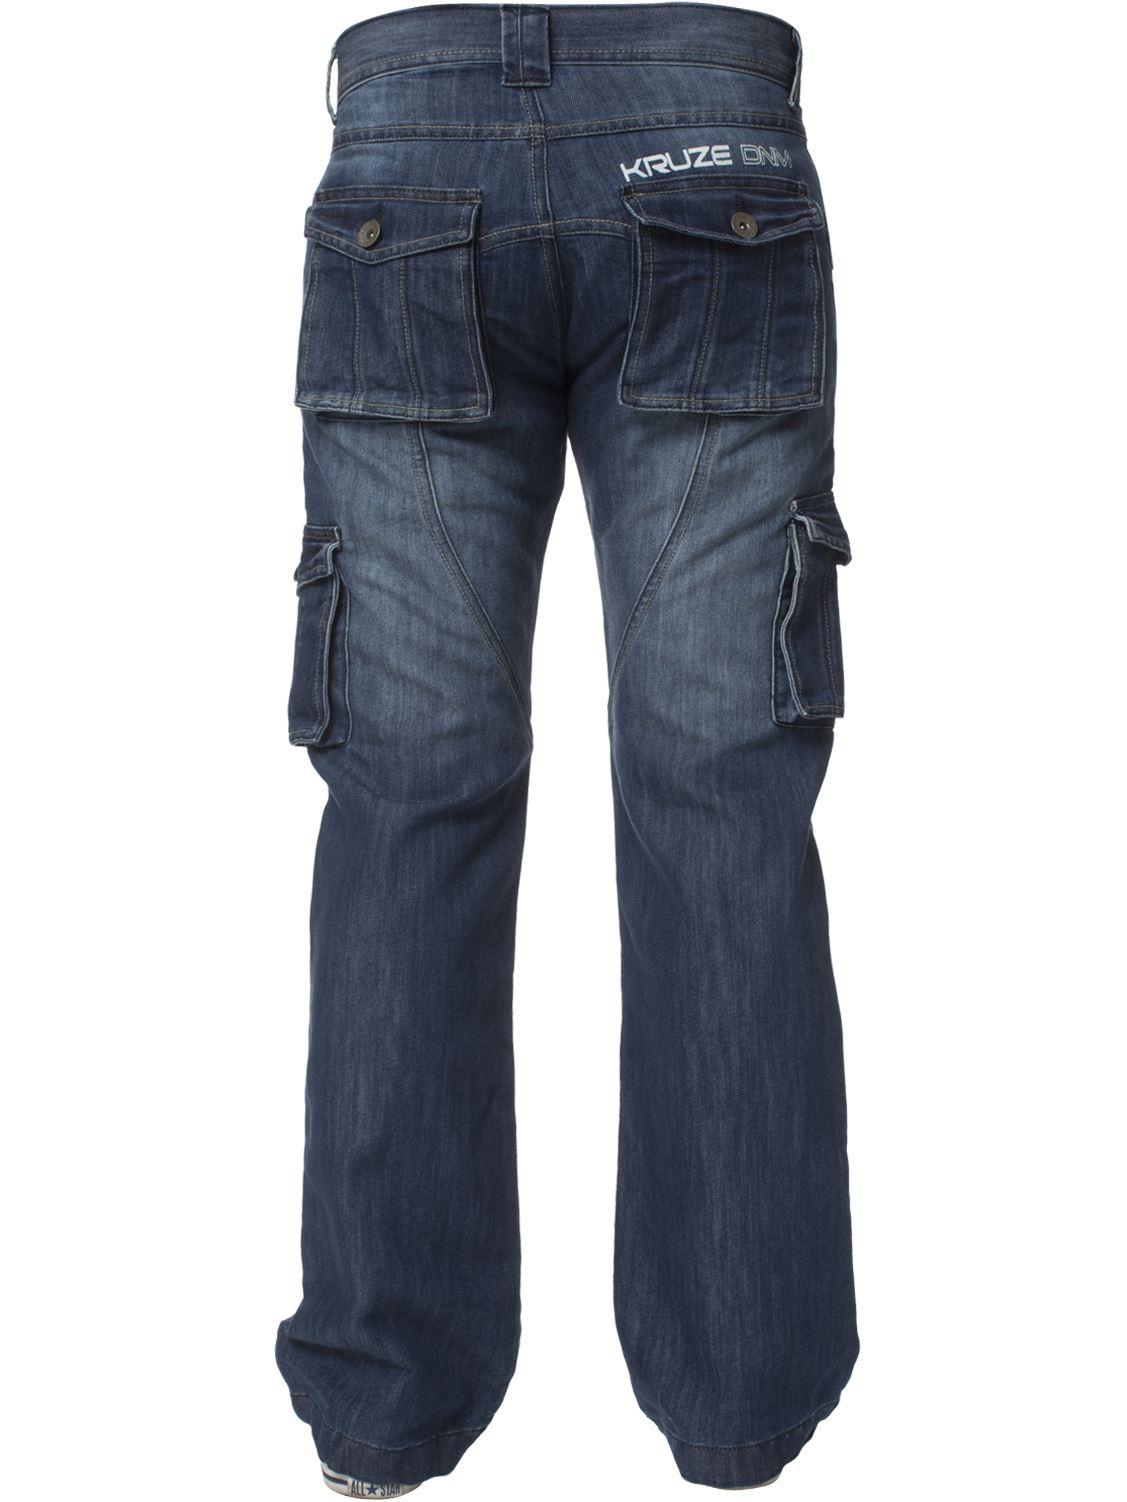 Grandes-jeans-para-hombre-de-combate-de-Kruze-Rey-Alto-Pierna-Cargo-Pantalones-Jeans-Pantalones miniatura 4